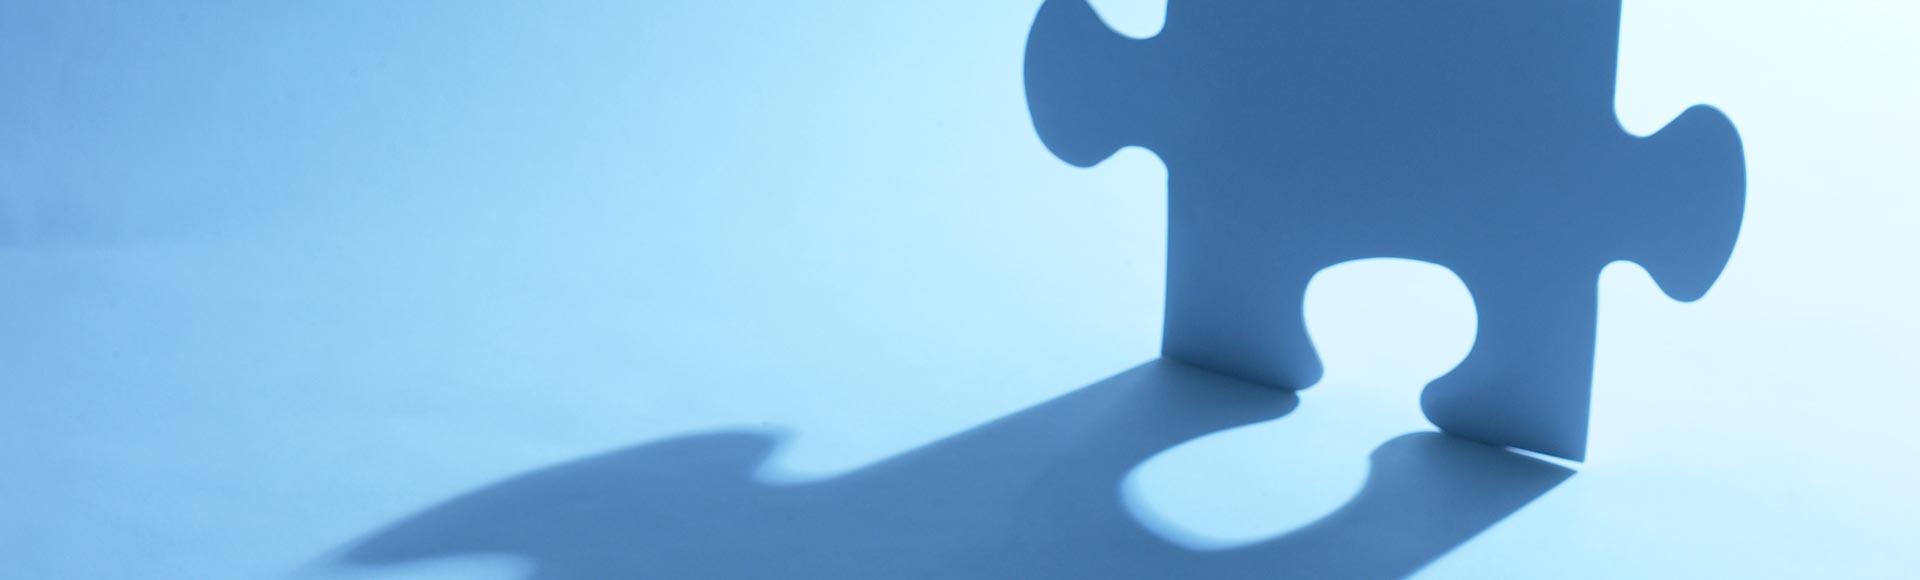 Aclarando acuerdos estratégicos normales entre aseguradoras